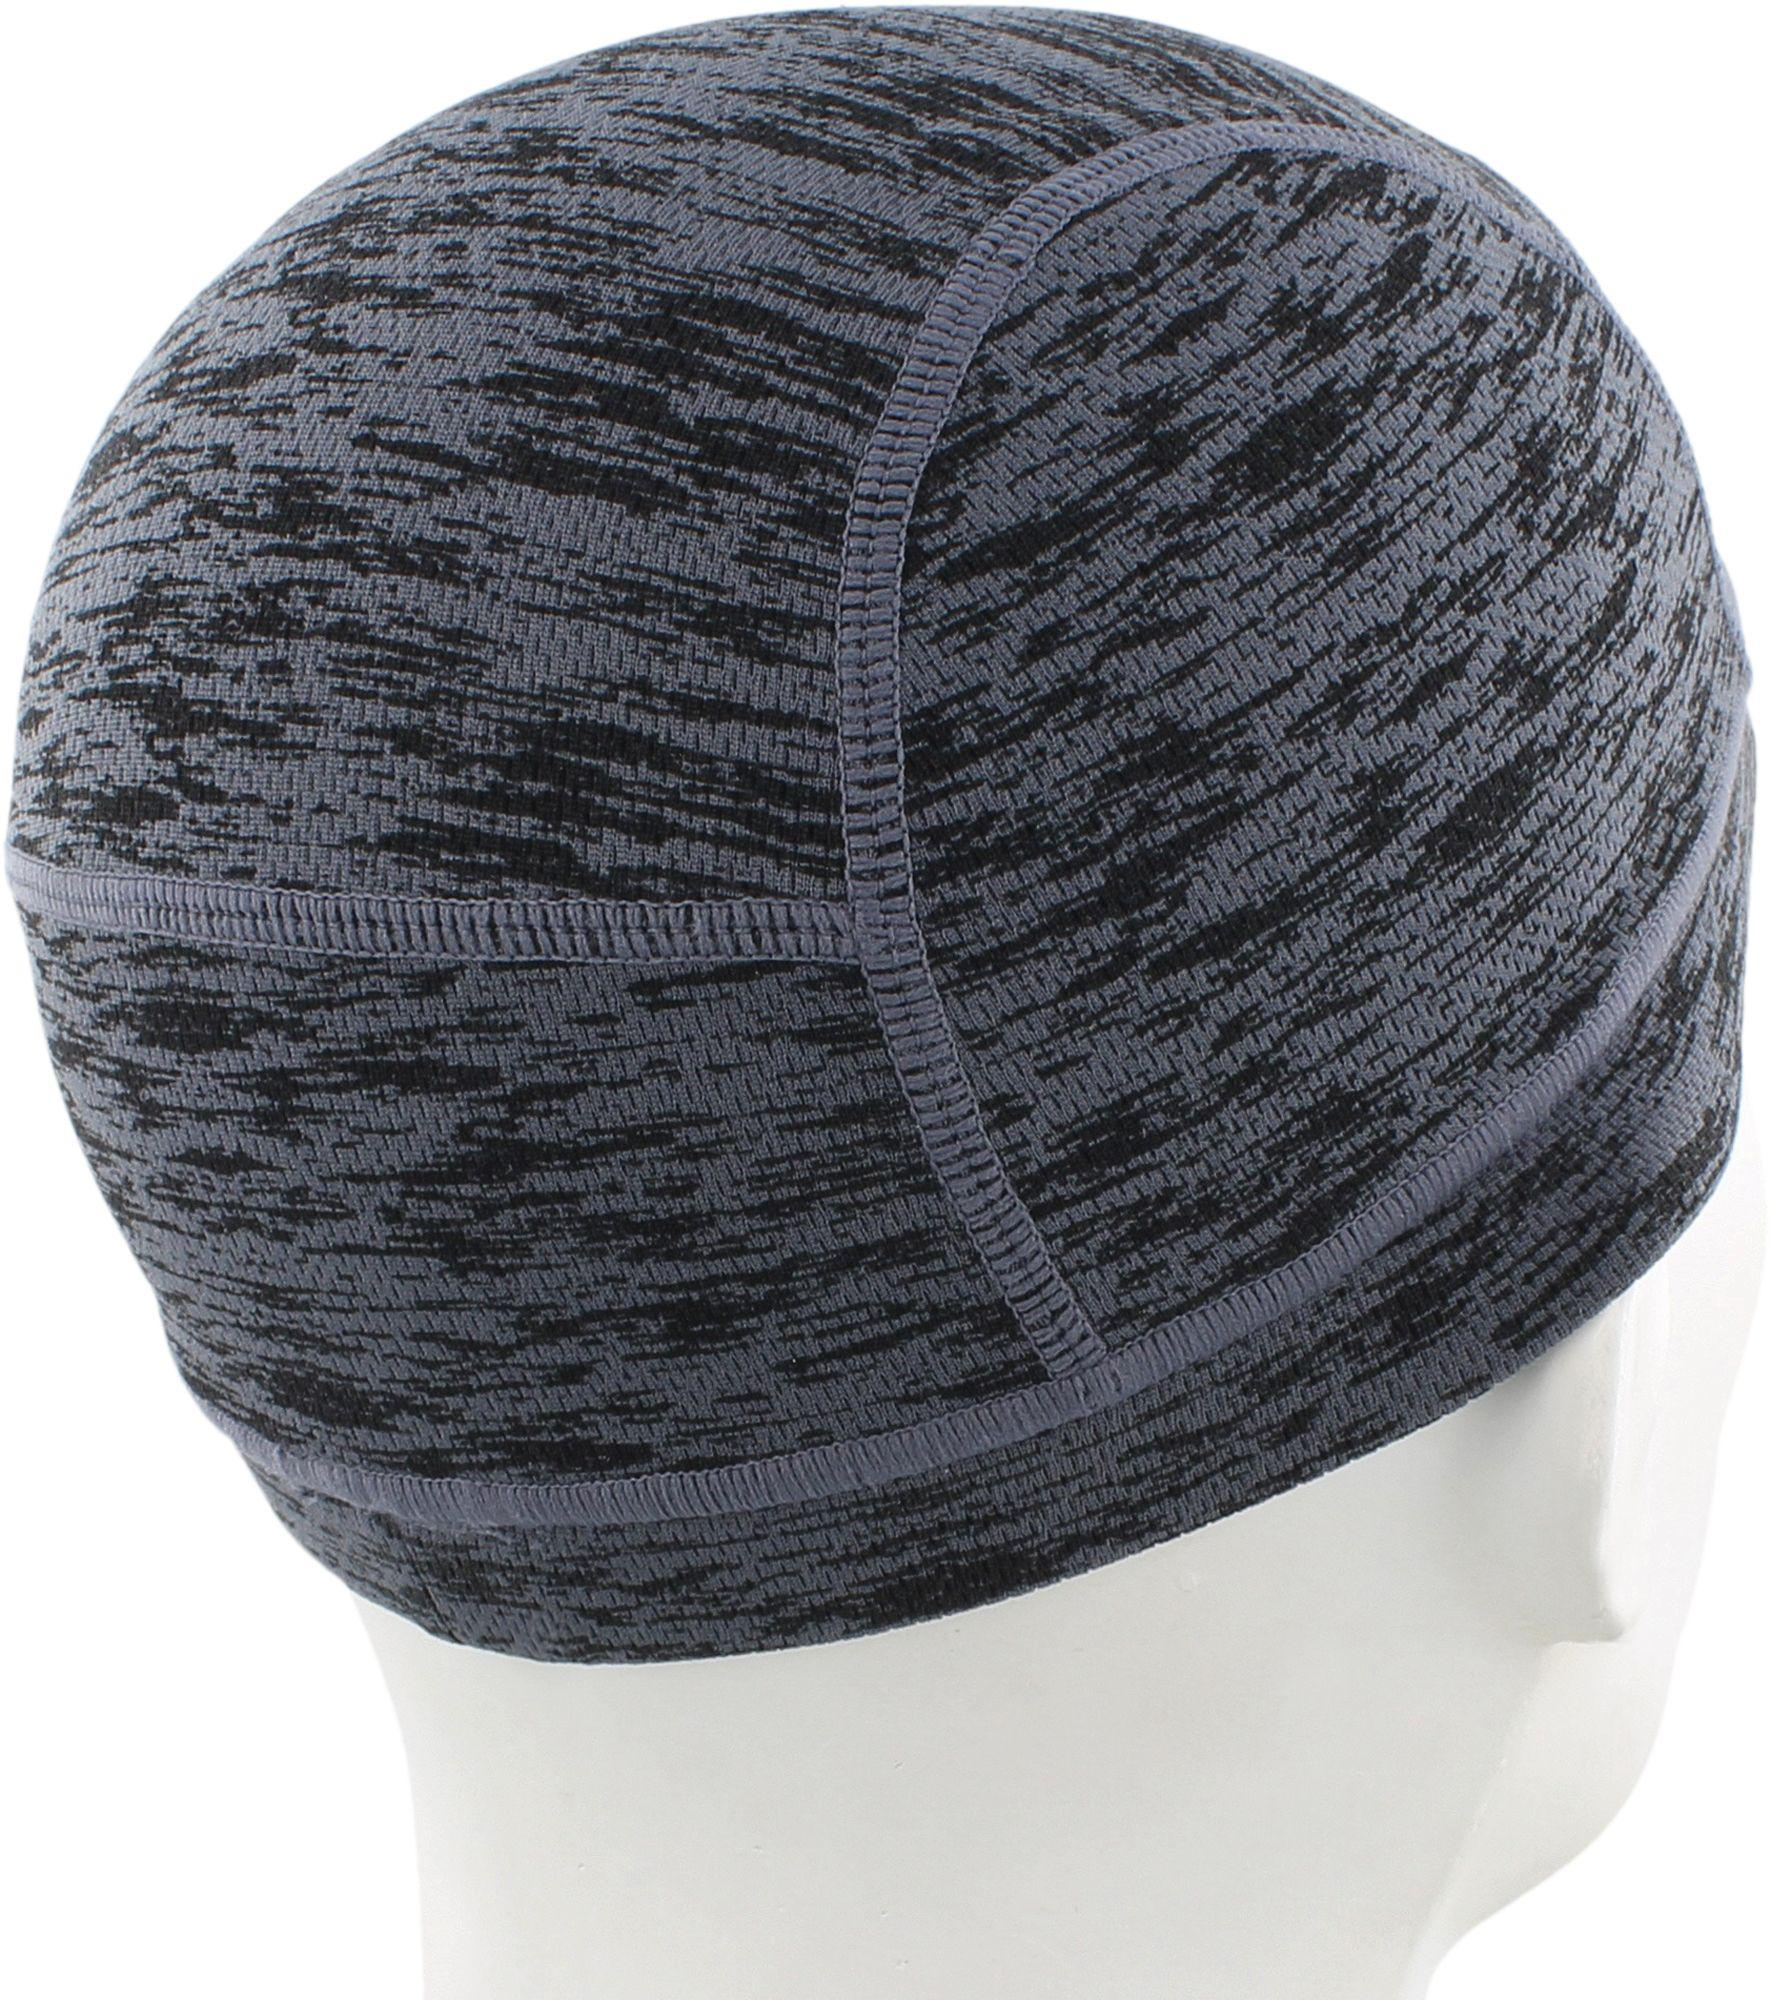 Adidas - Black Climacool Football Skull Cap for Men - Lyst. View fullscreen f2efe35ab5a